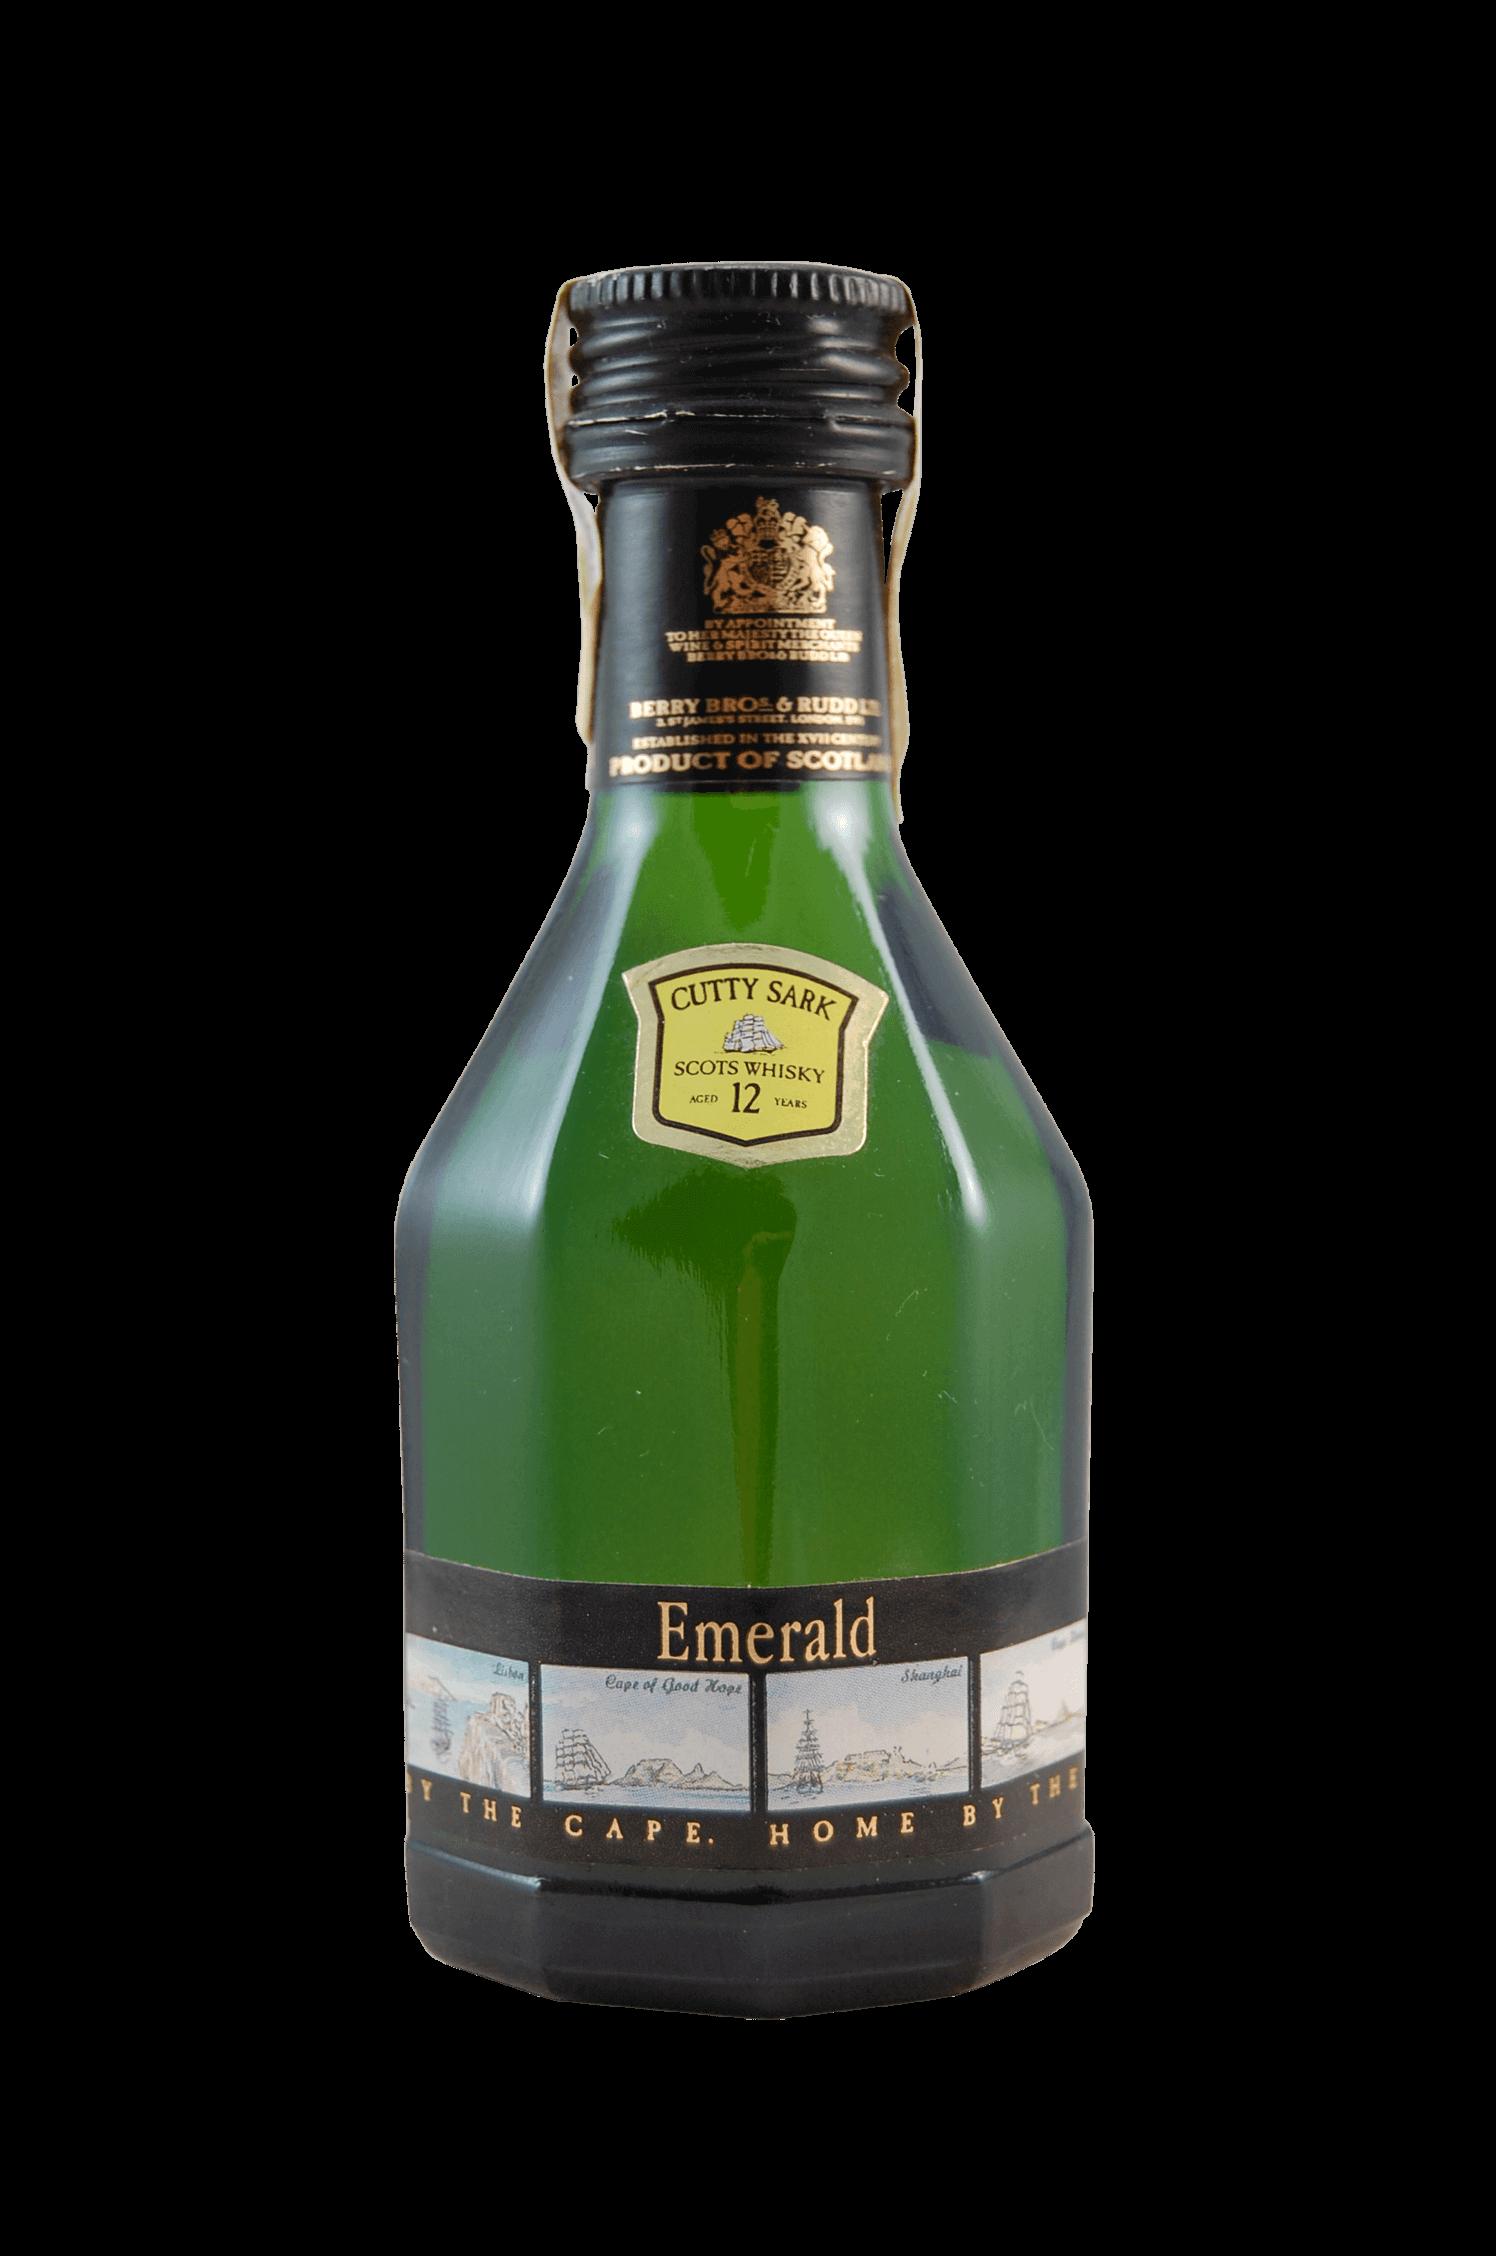 Emerald Scotch Whisky